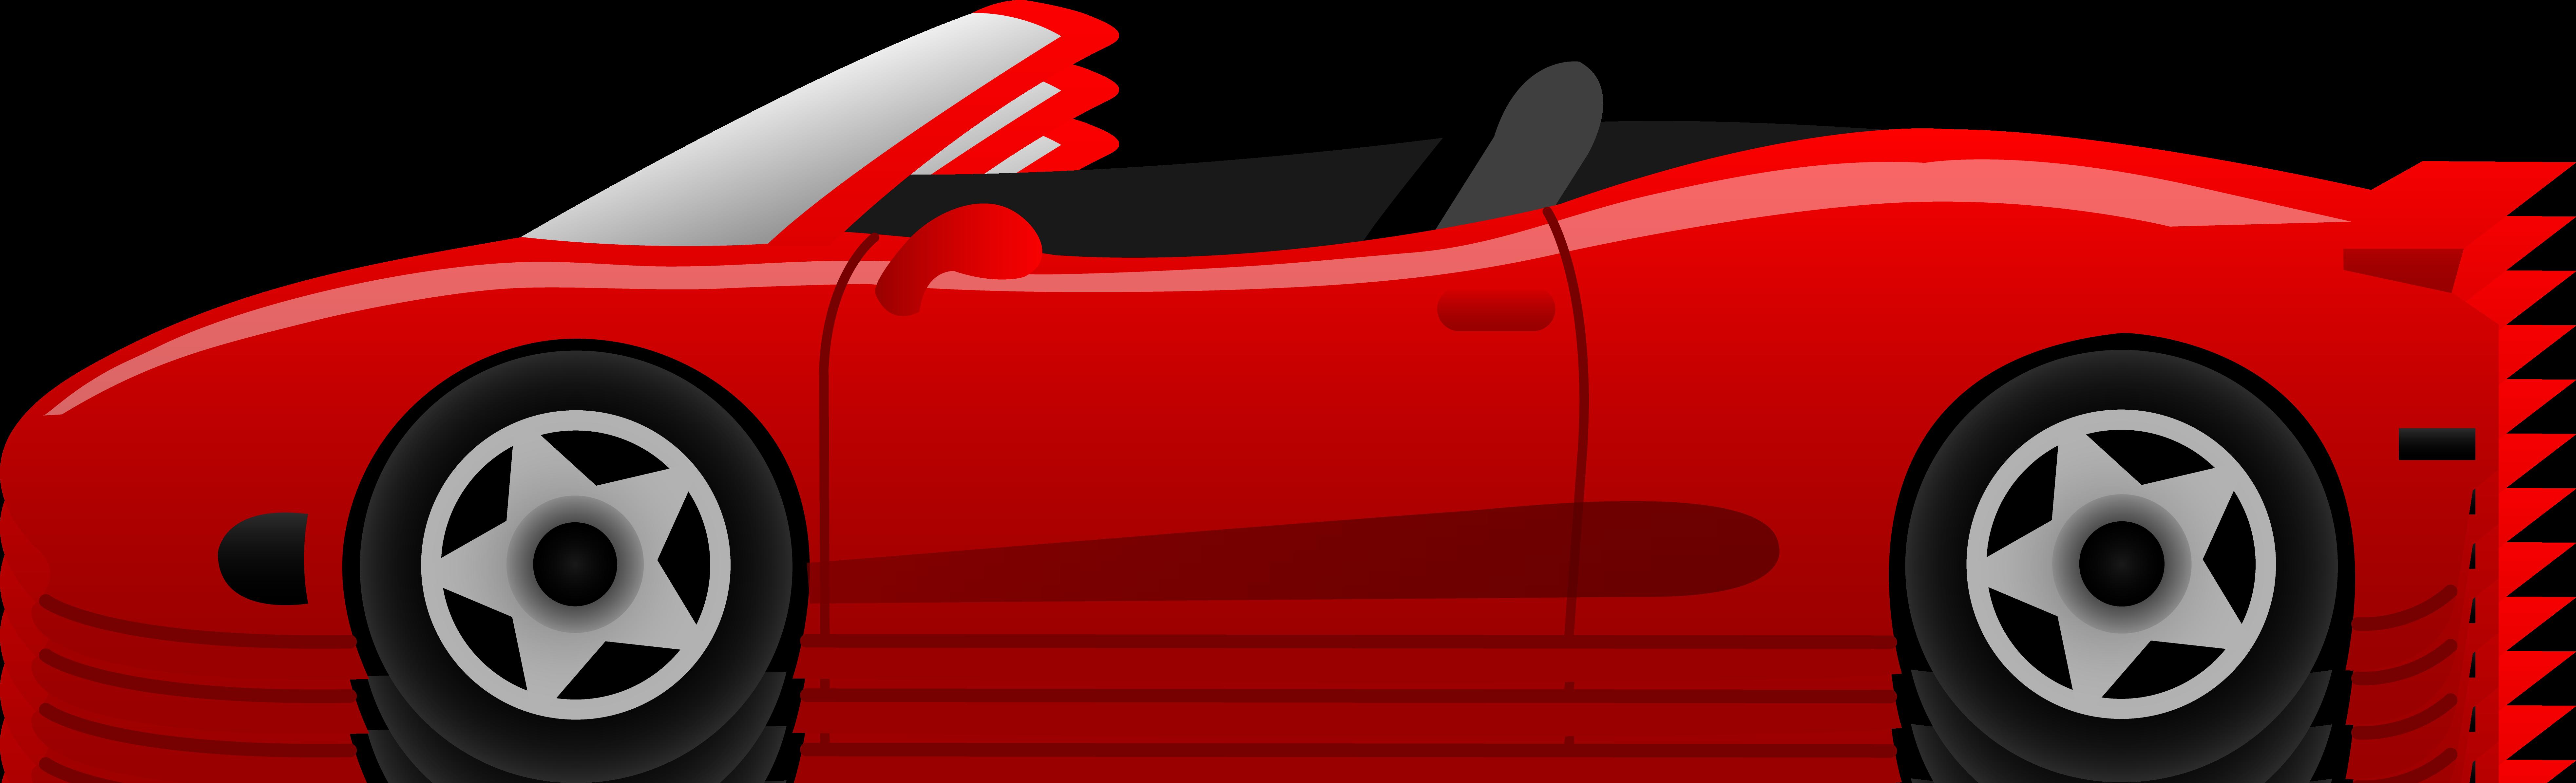 7863x2391 Race Car Clipart Clipart Free Clipart Images